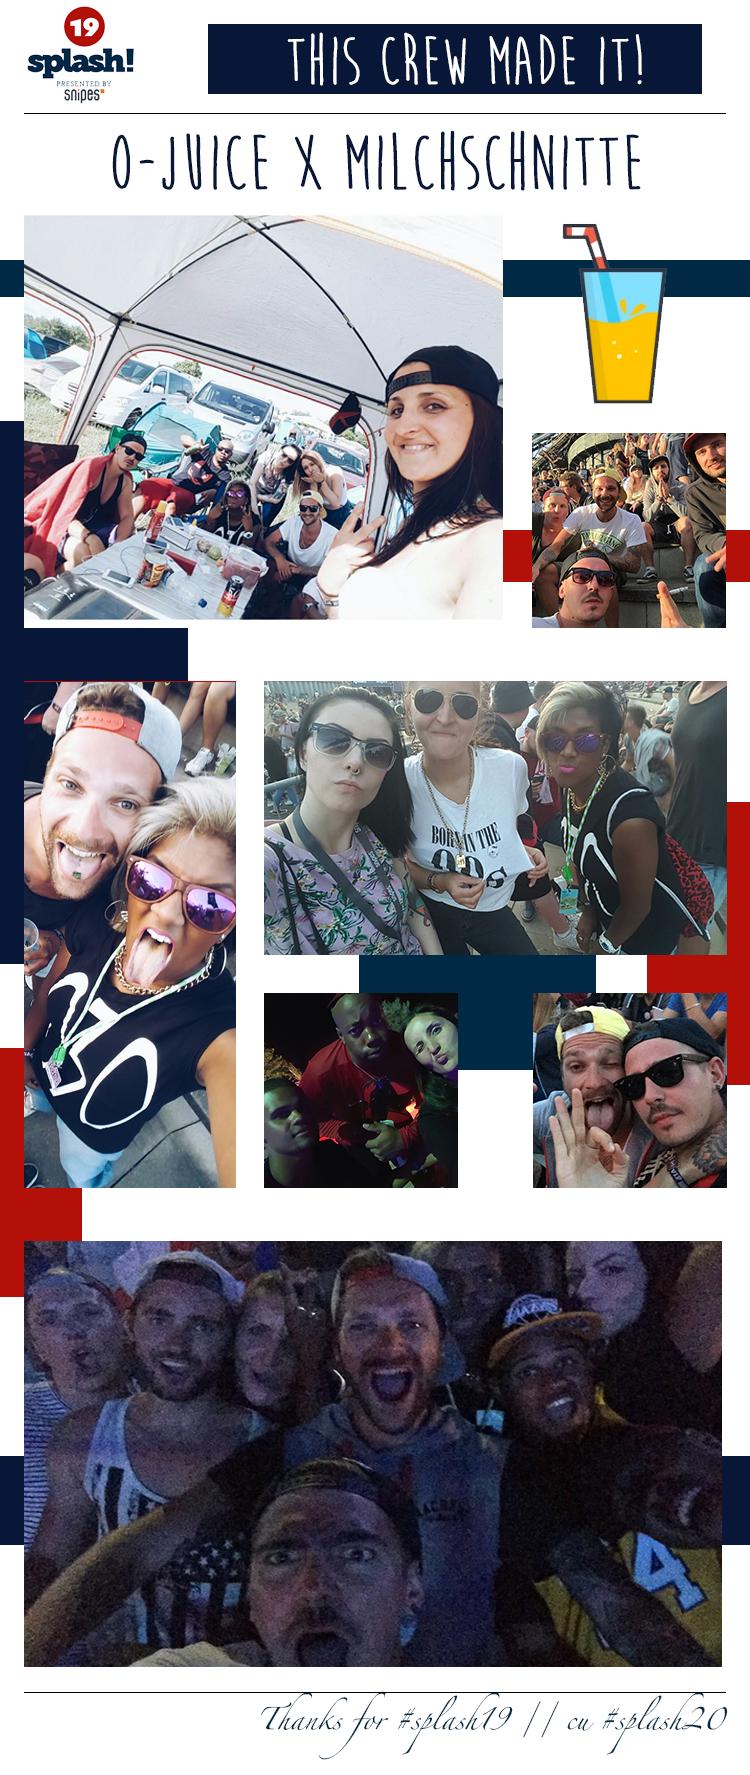 splash! Festival 2016 tonrabbit OMG